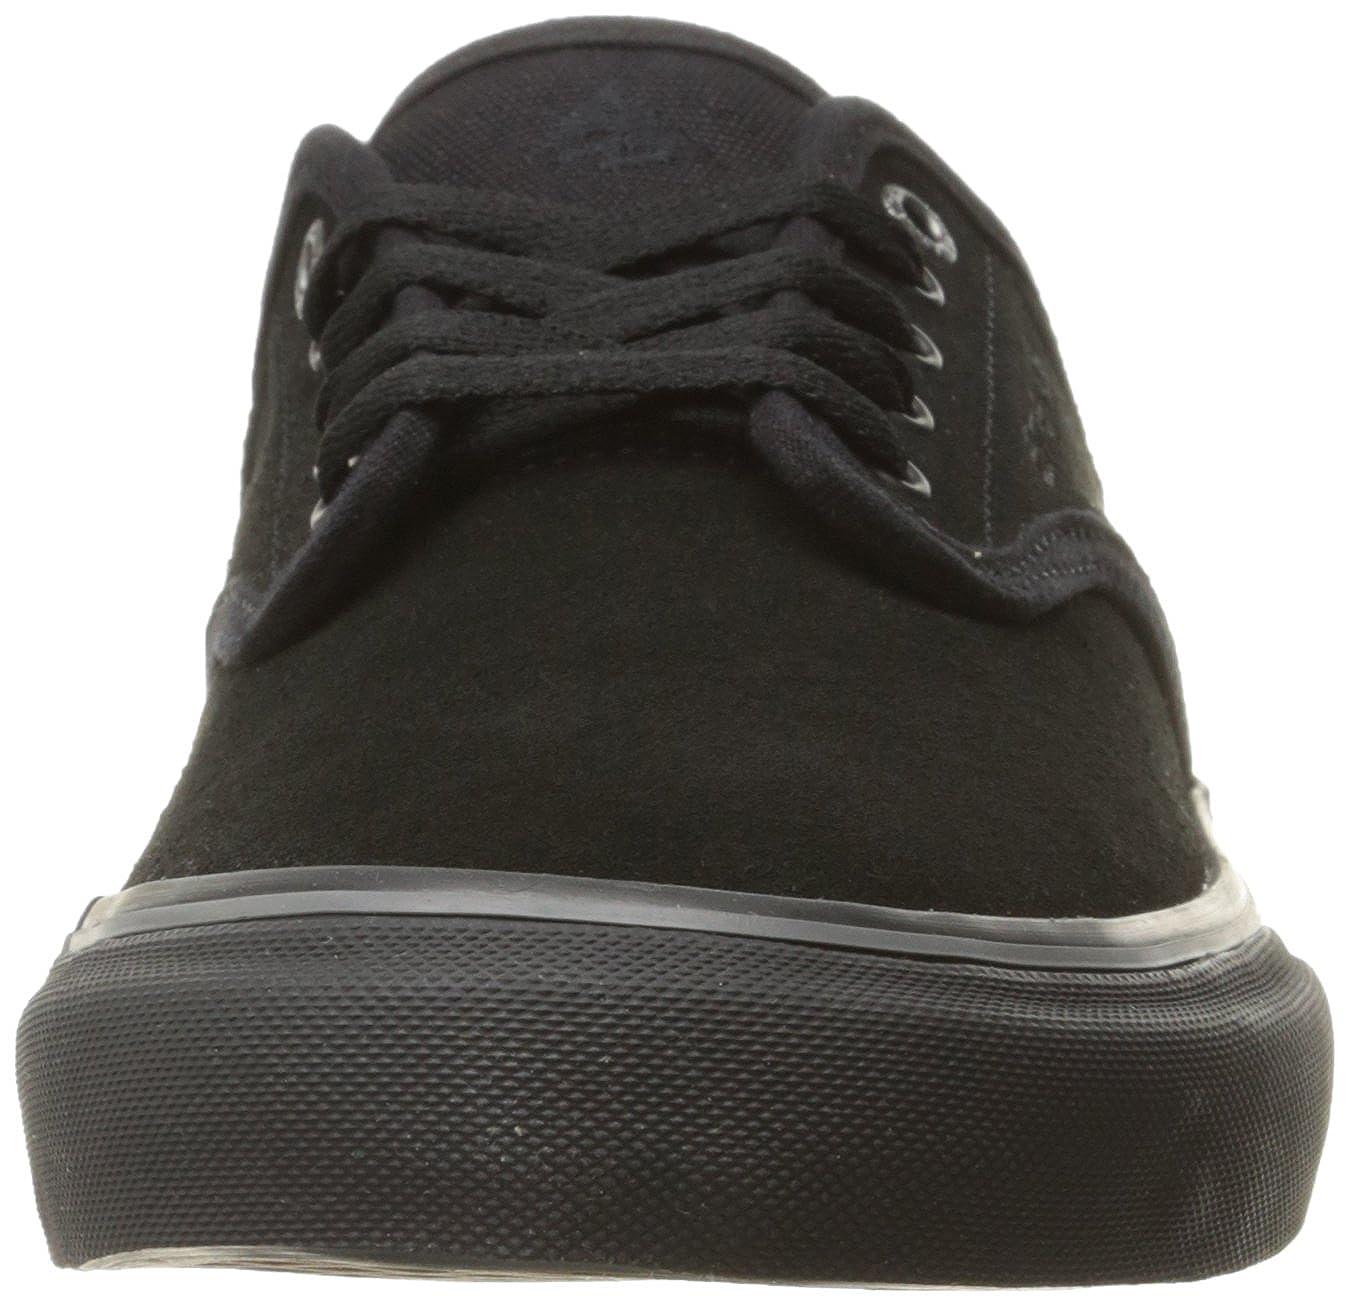 competitive price fdc1d 38641 ... Emerica Emerica Emerica Men s Wino G6 Skate Shoe 7 M US Black black  B01IFT8766 ...